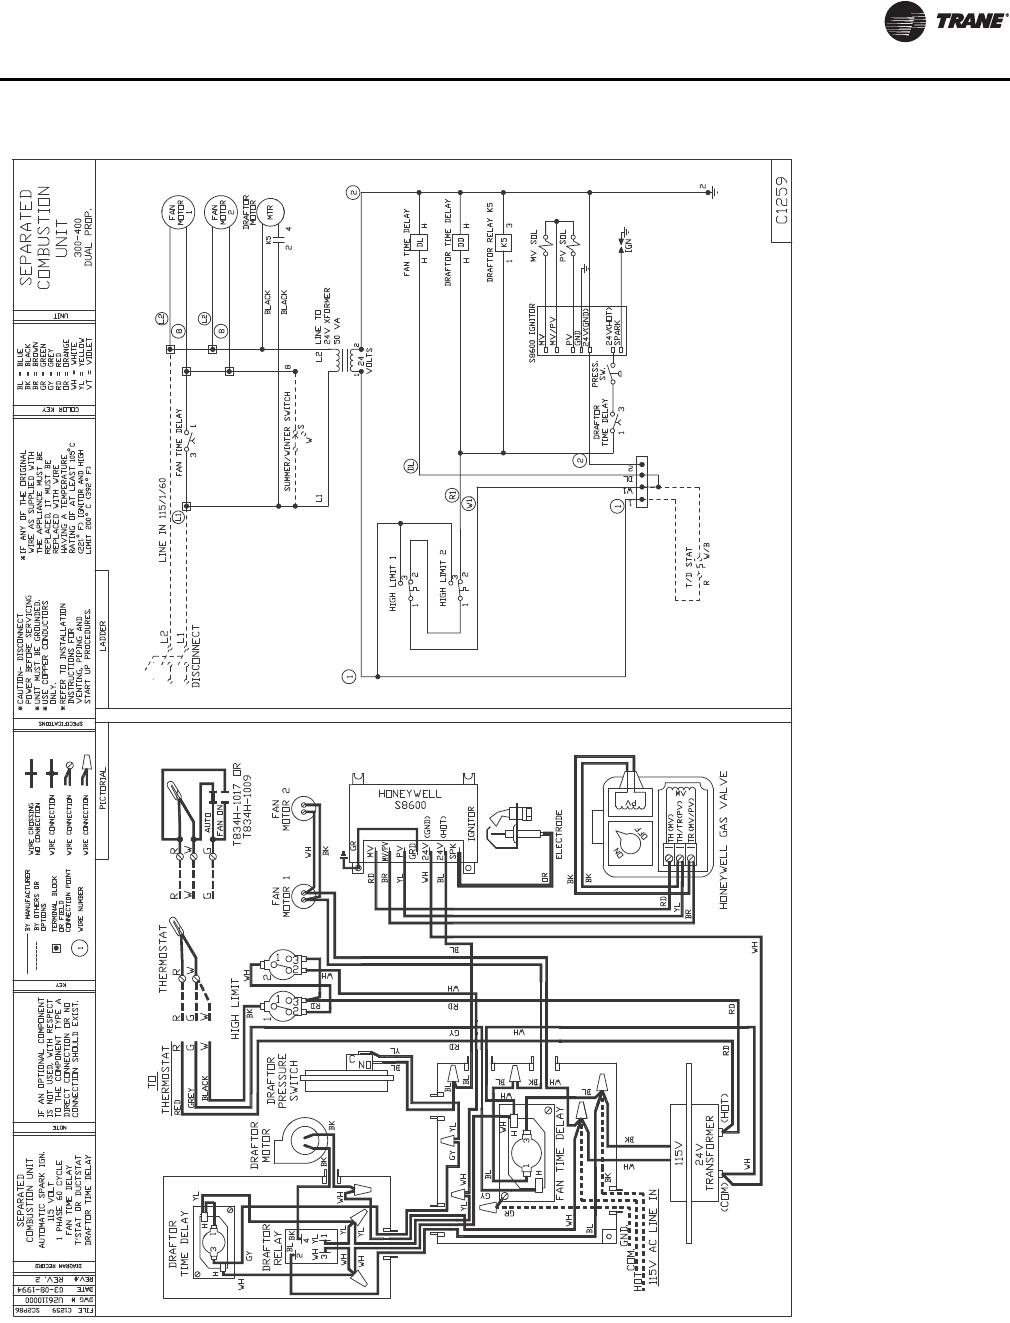 Trane Gas Unit Heaters Installation And Maintenance Manual